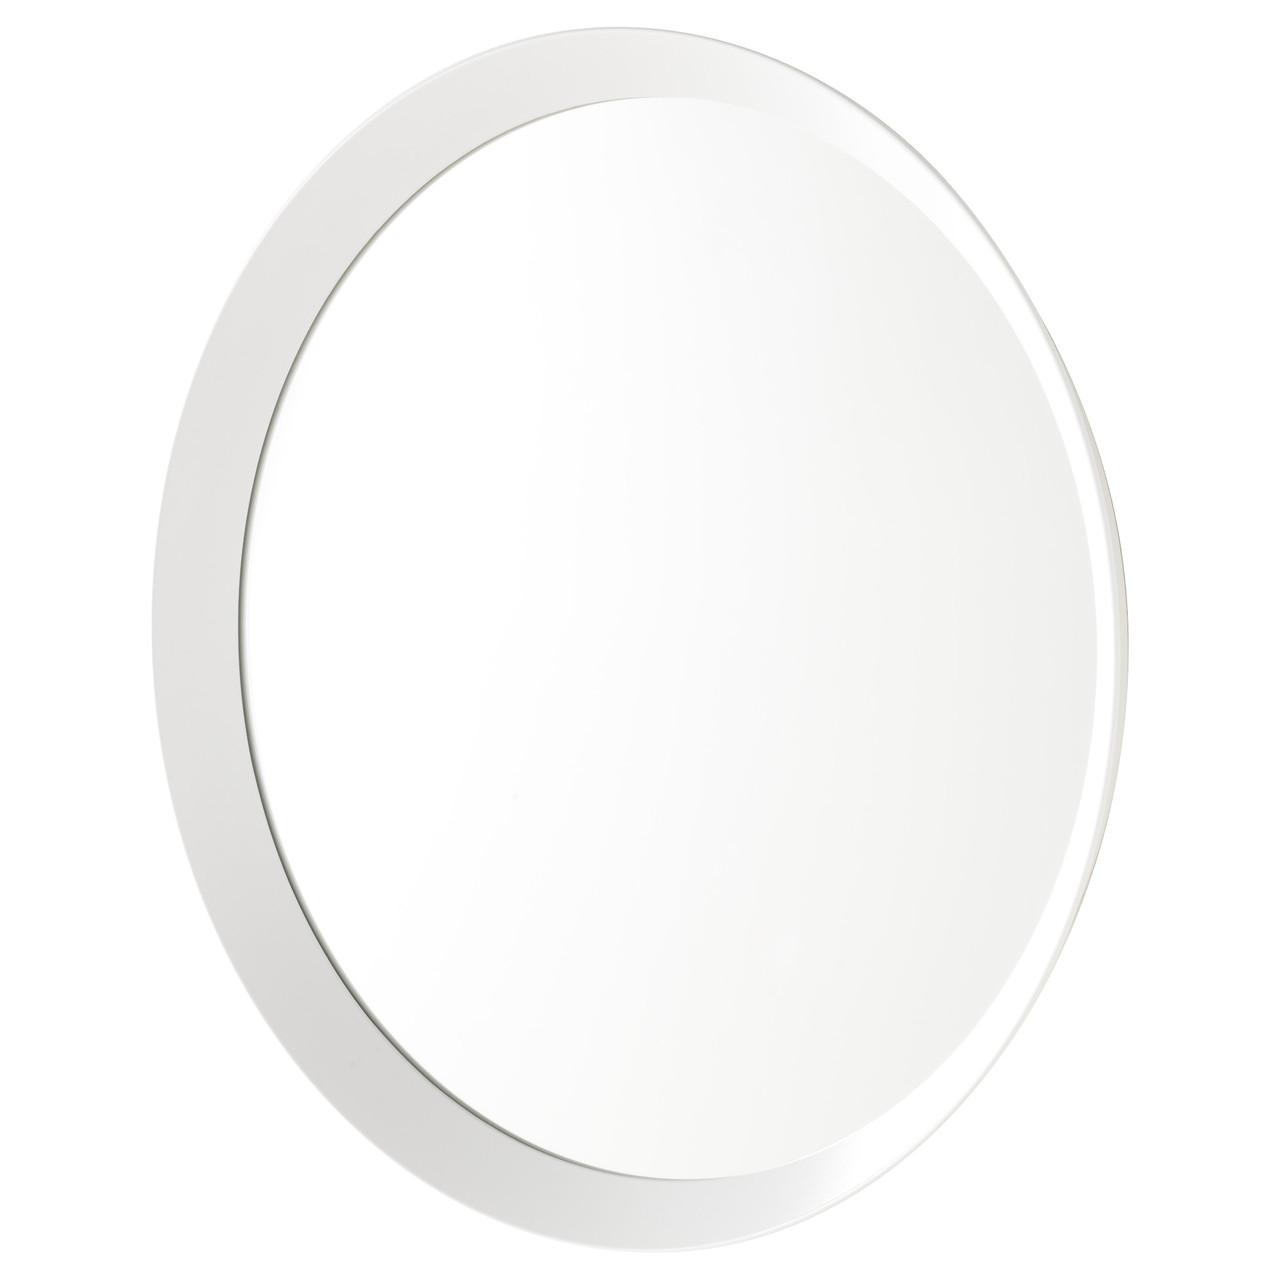 LANGESUND Lustro, biały 602.886.83